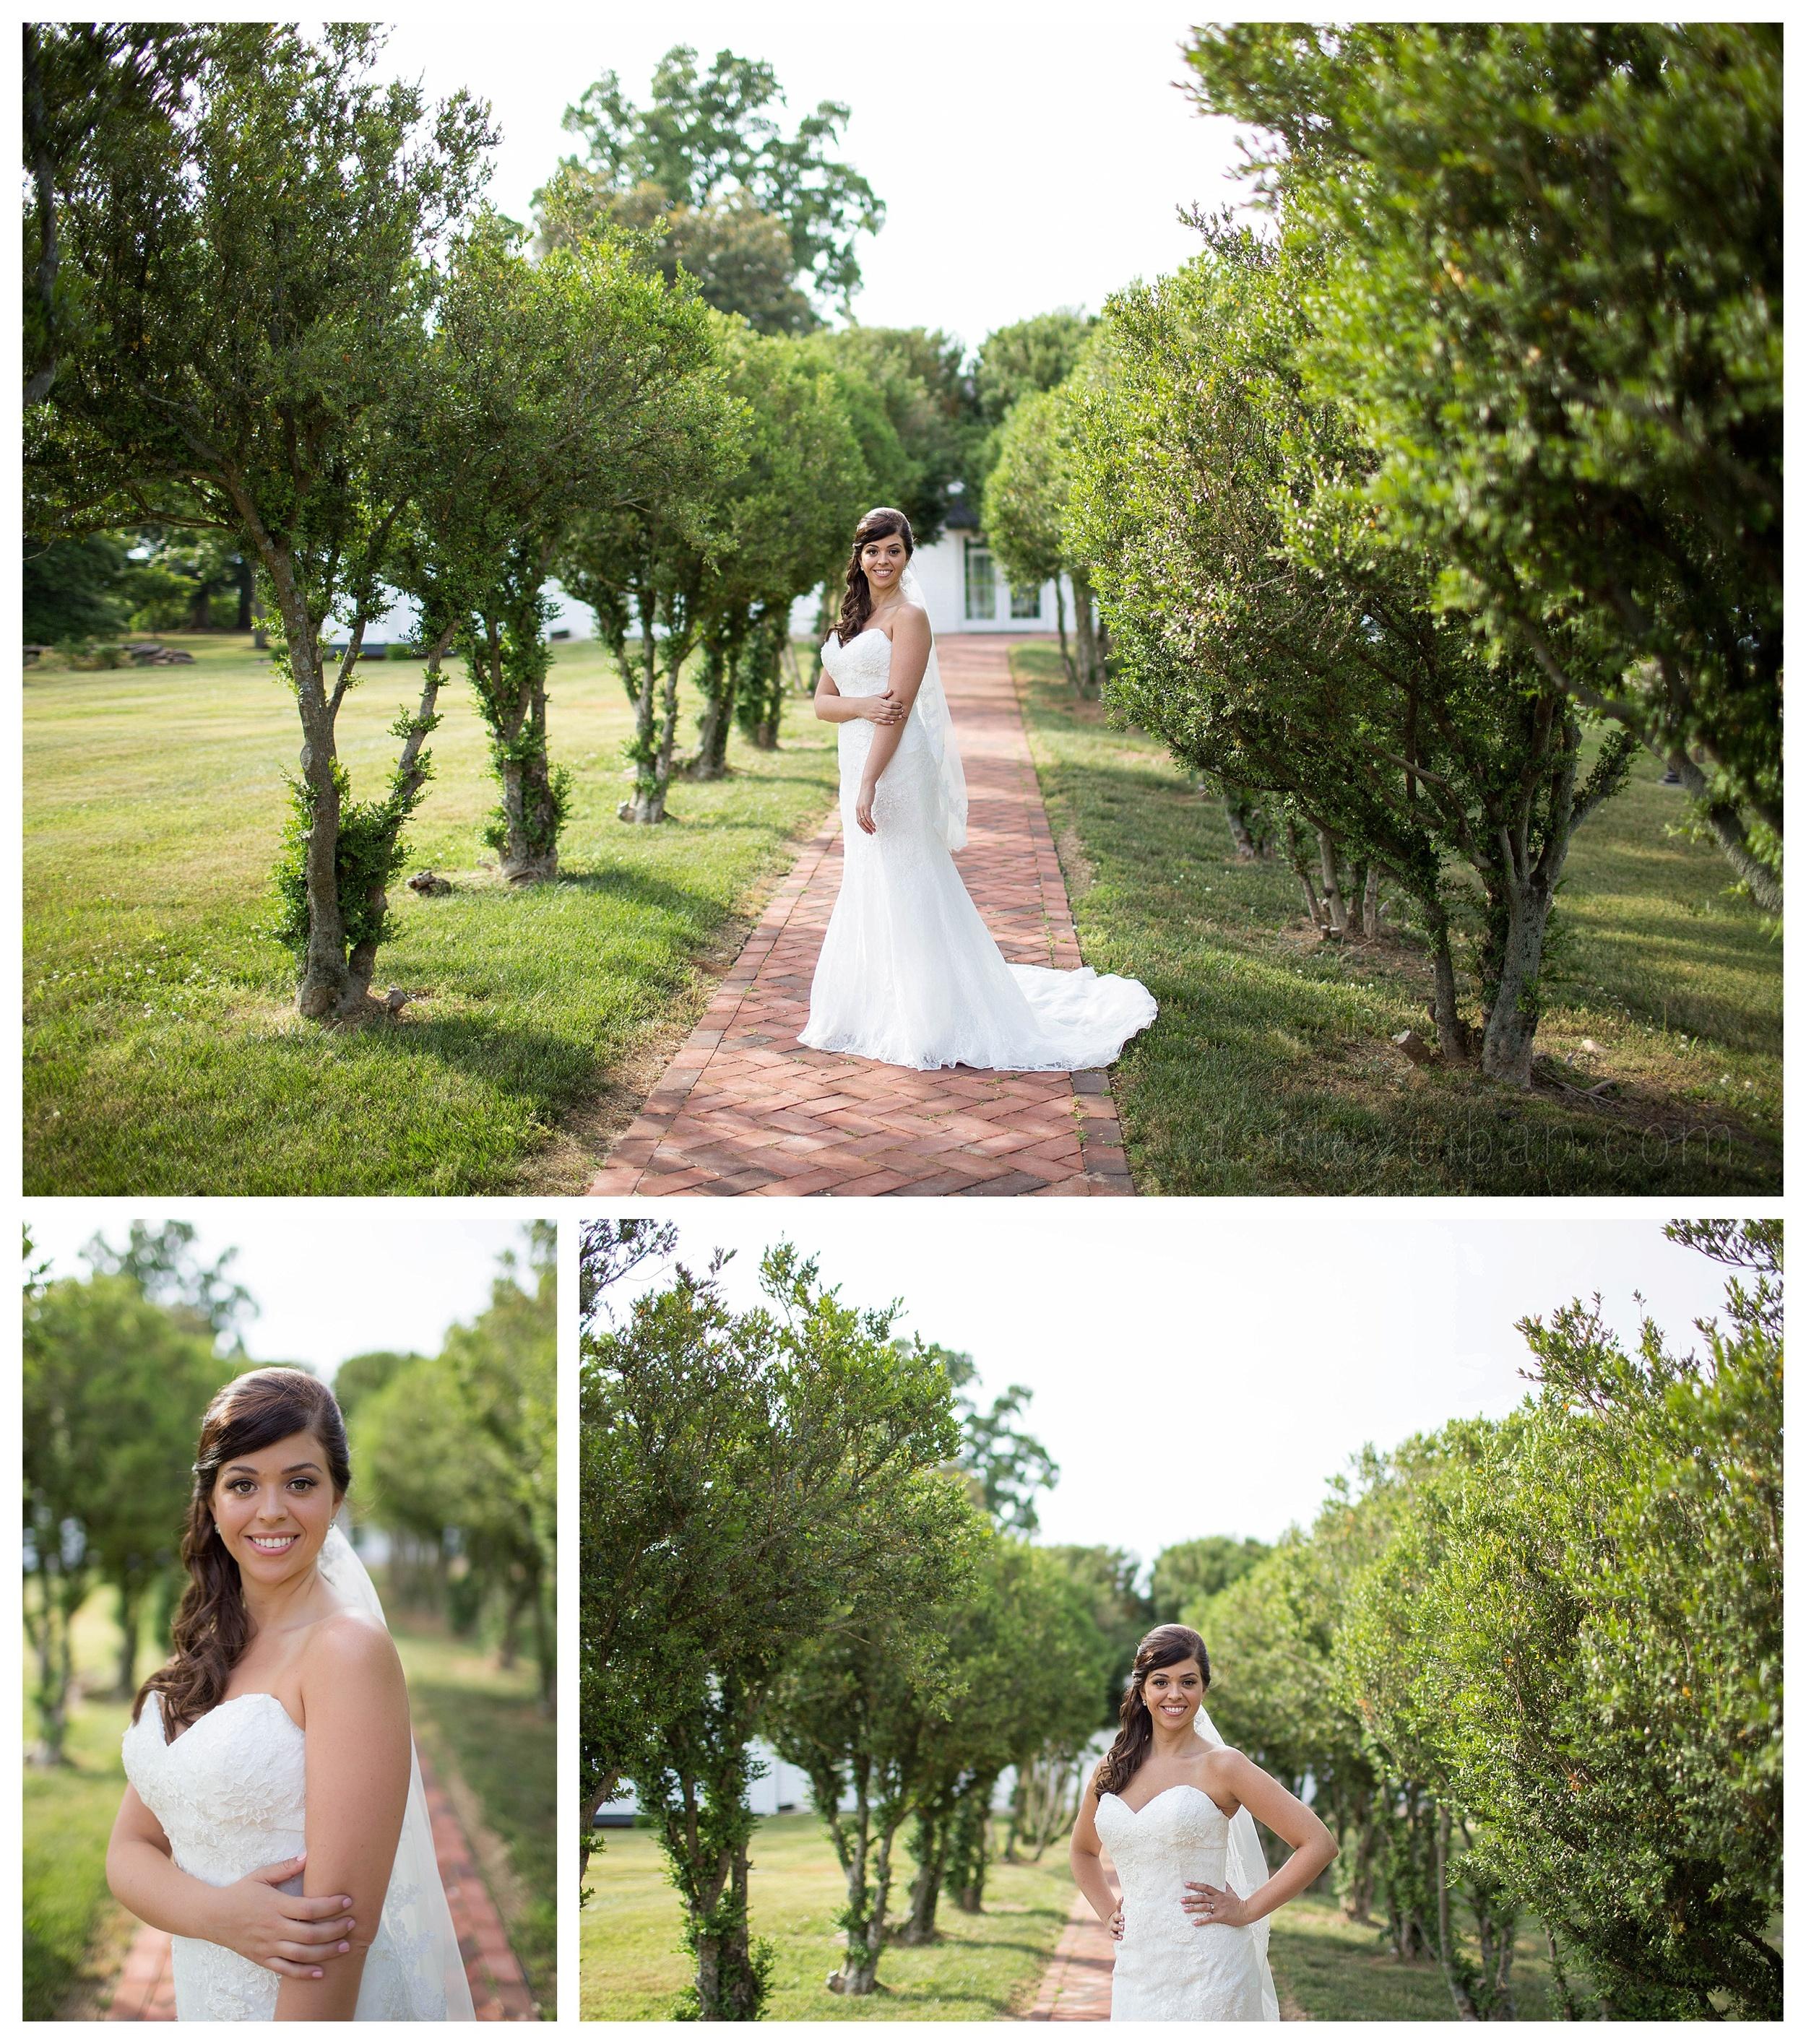 Lynchburg Virginia Wedding Photographer, The Trivium Estates, Ashley Eiban Photography